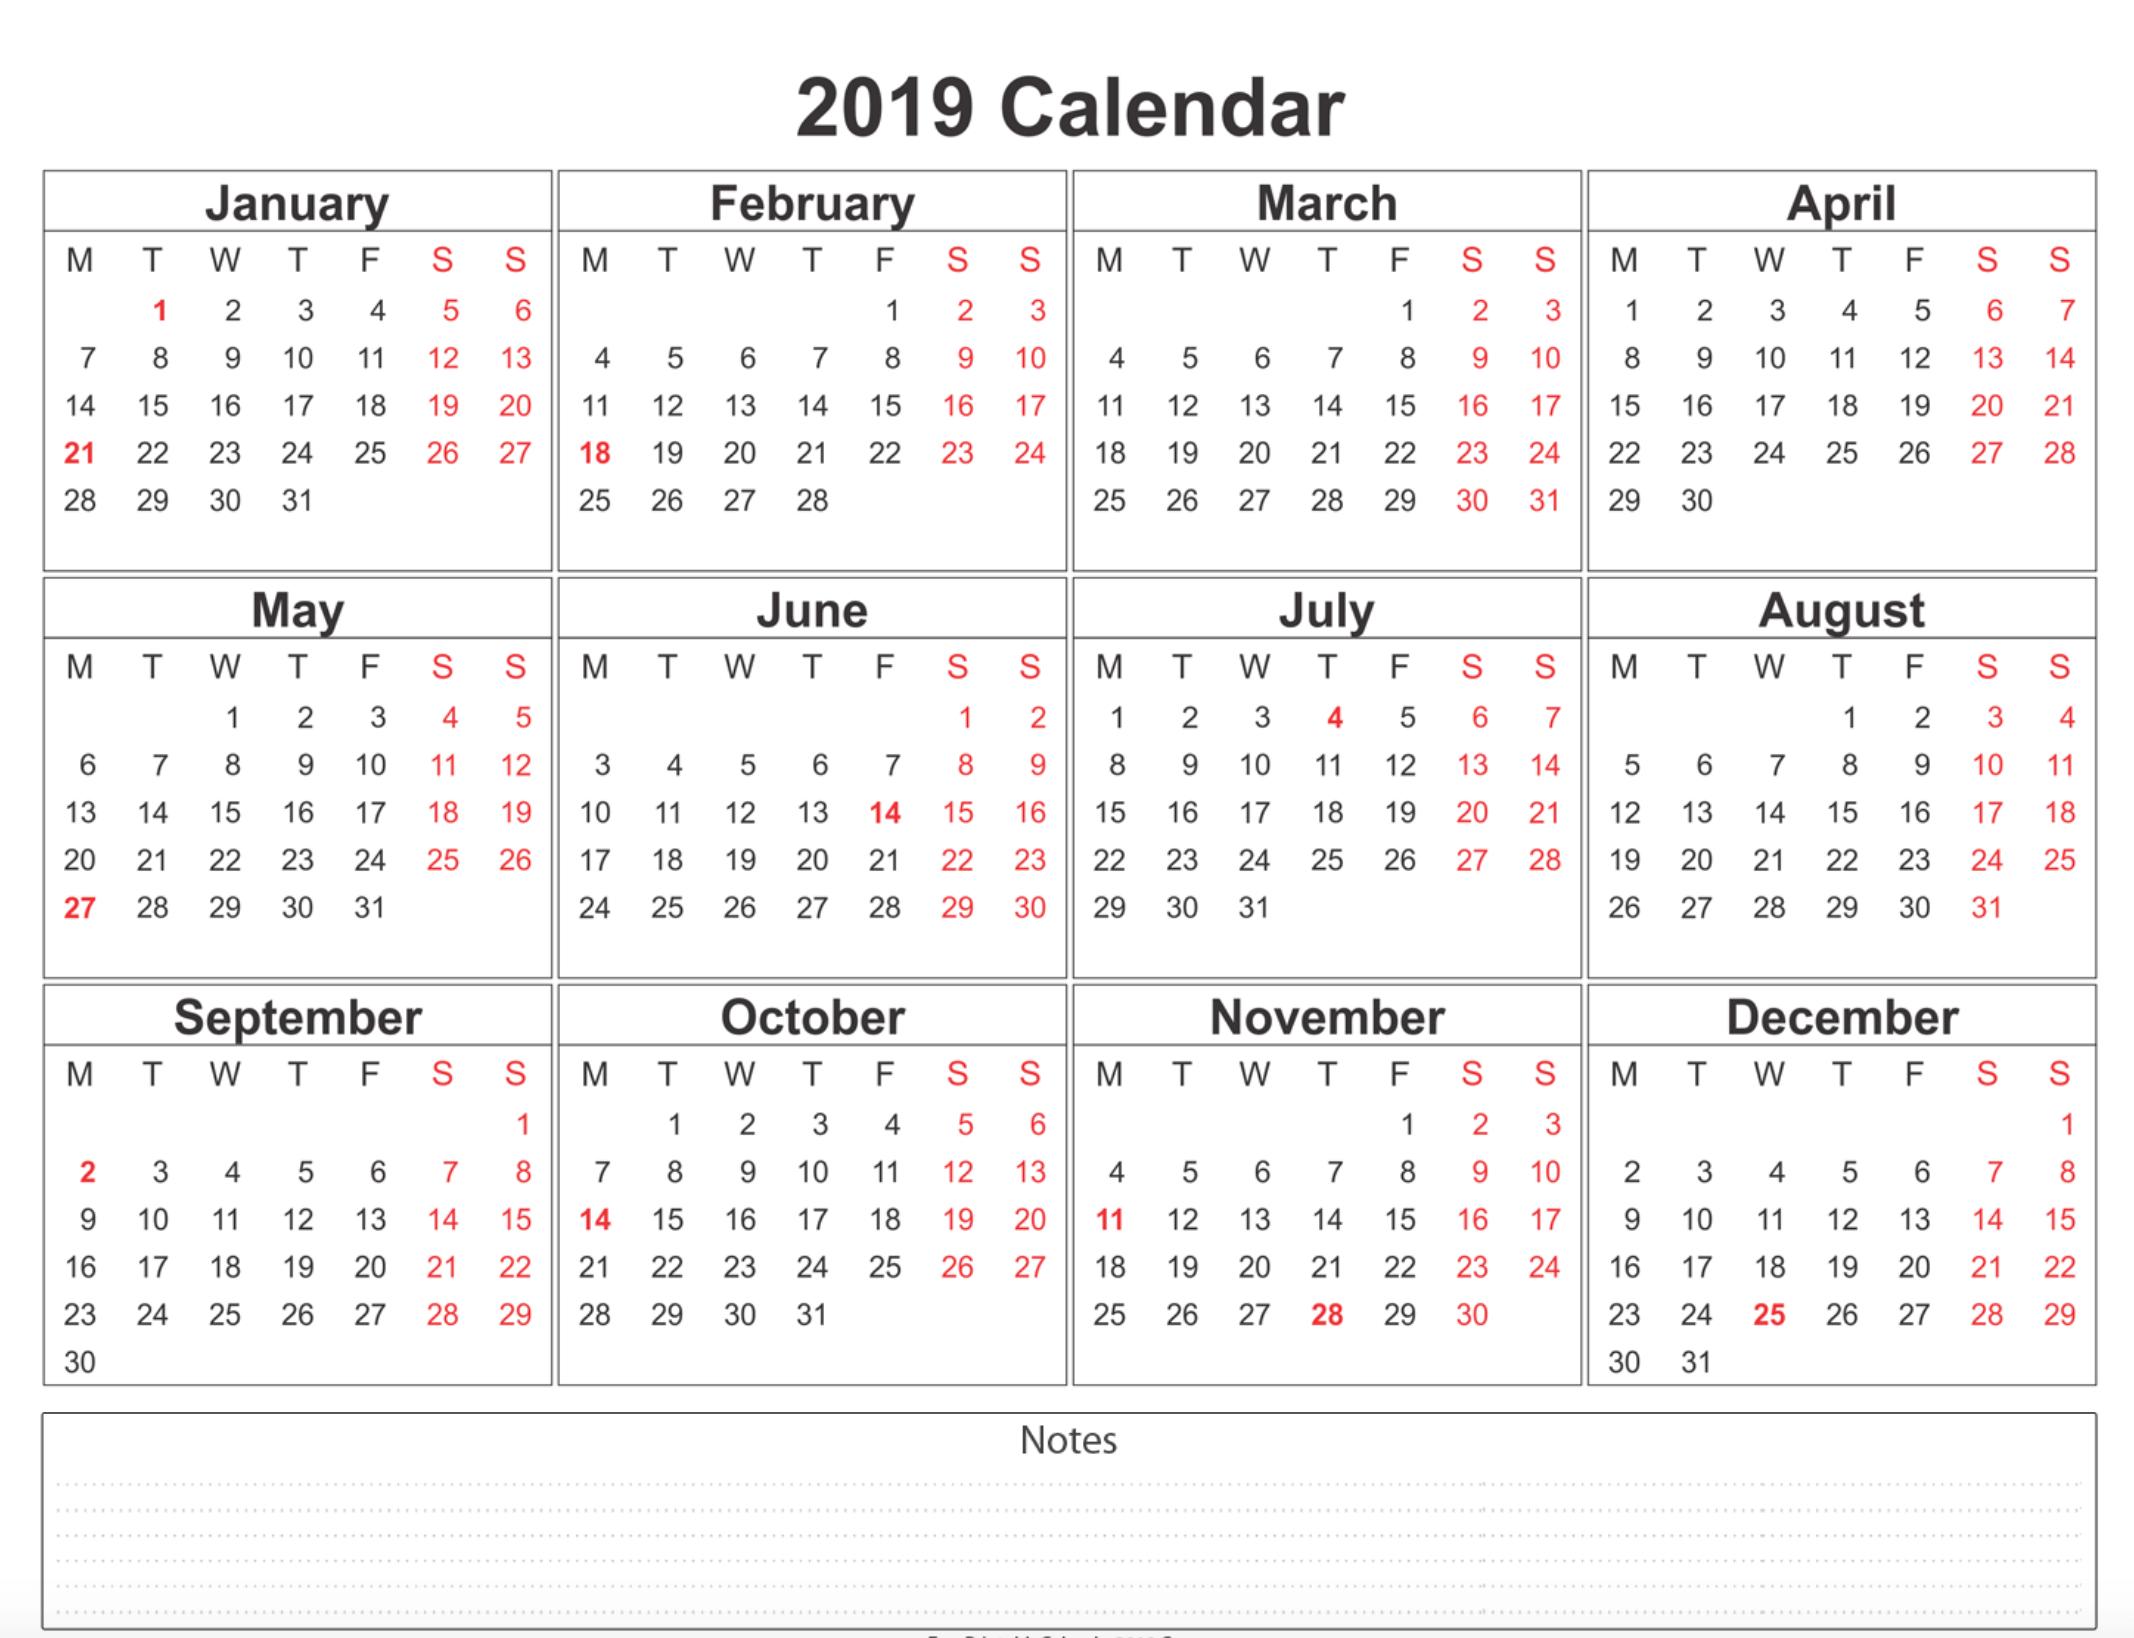 Free Blank Printable Calendar 2019 With Holidays Template Word